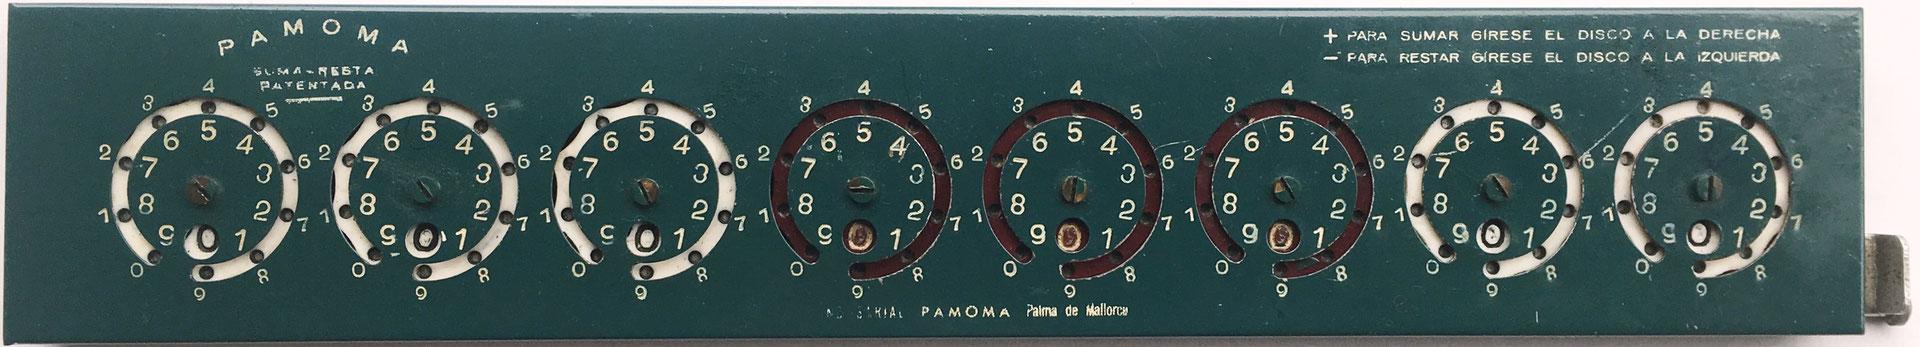 "PAMOMA (similar a Addometer Adding Machine, modelo B ""standar-decimal""), s/n 0022, Palma de Mallorca (ESPAÑA), hacia 1950, 29x6 cm"